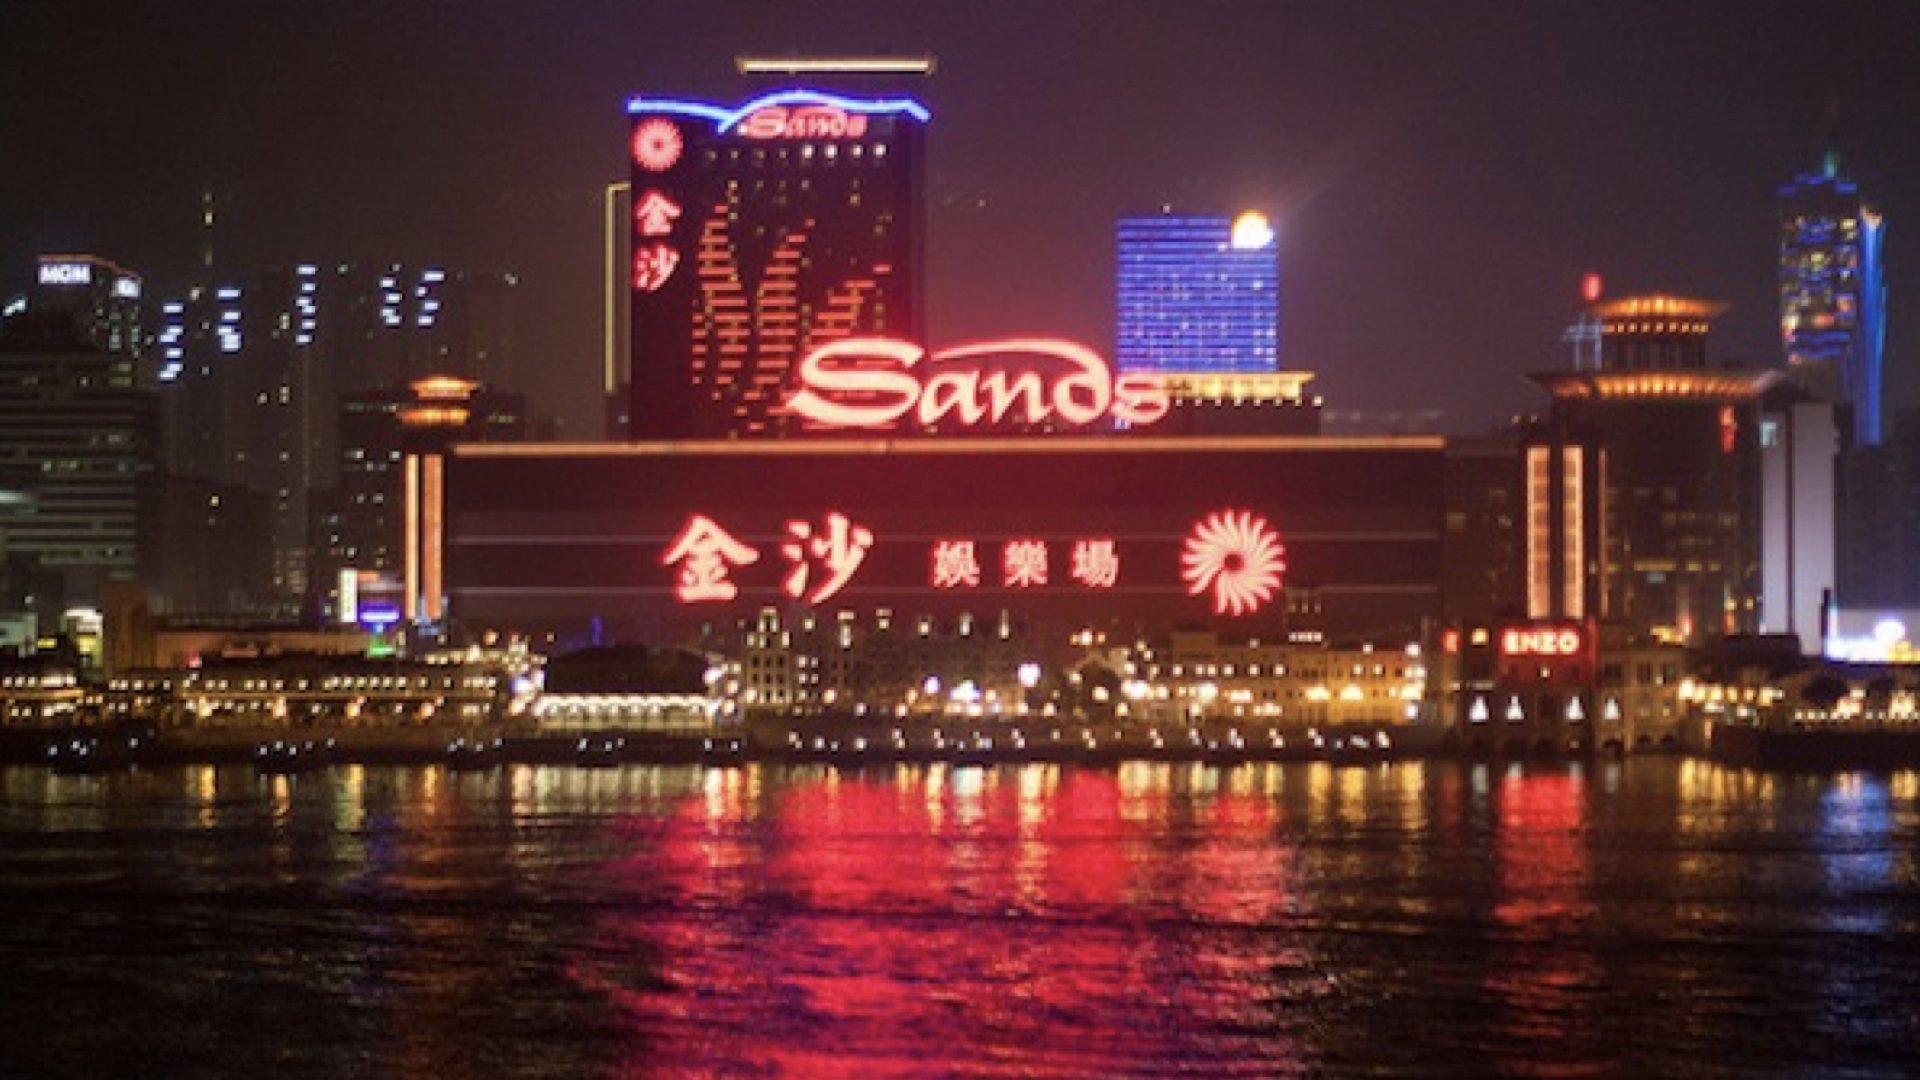 Sands China Key Driver